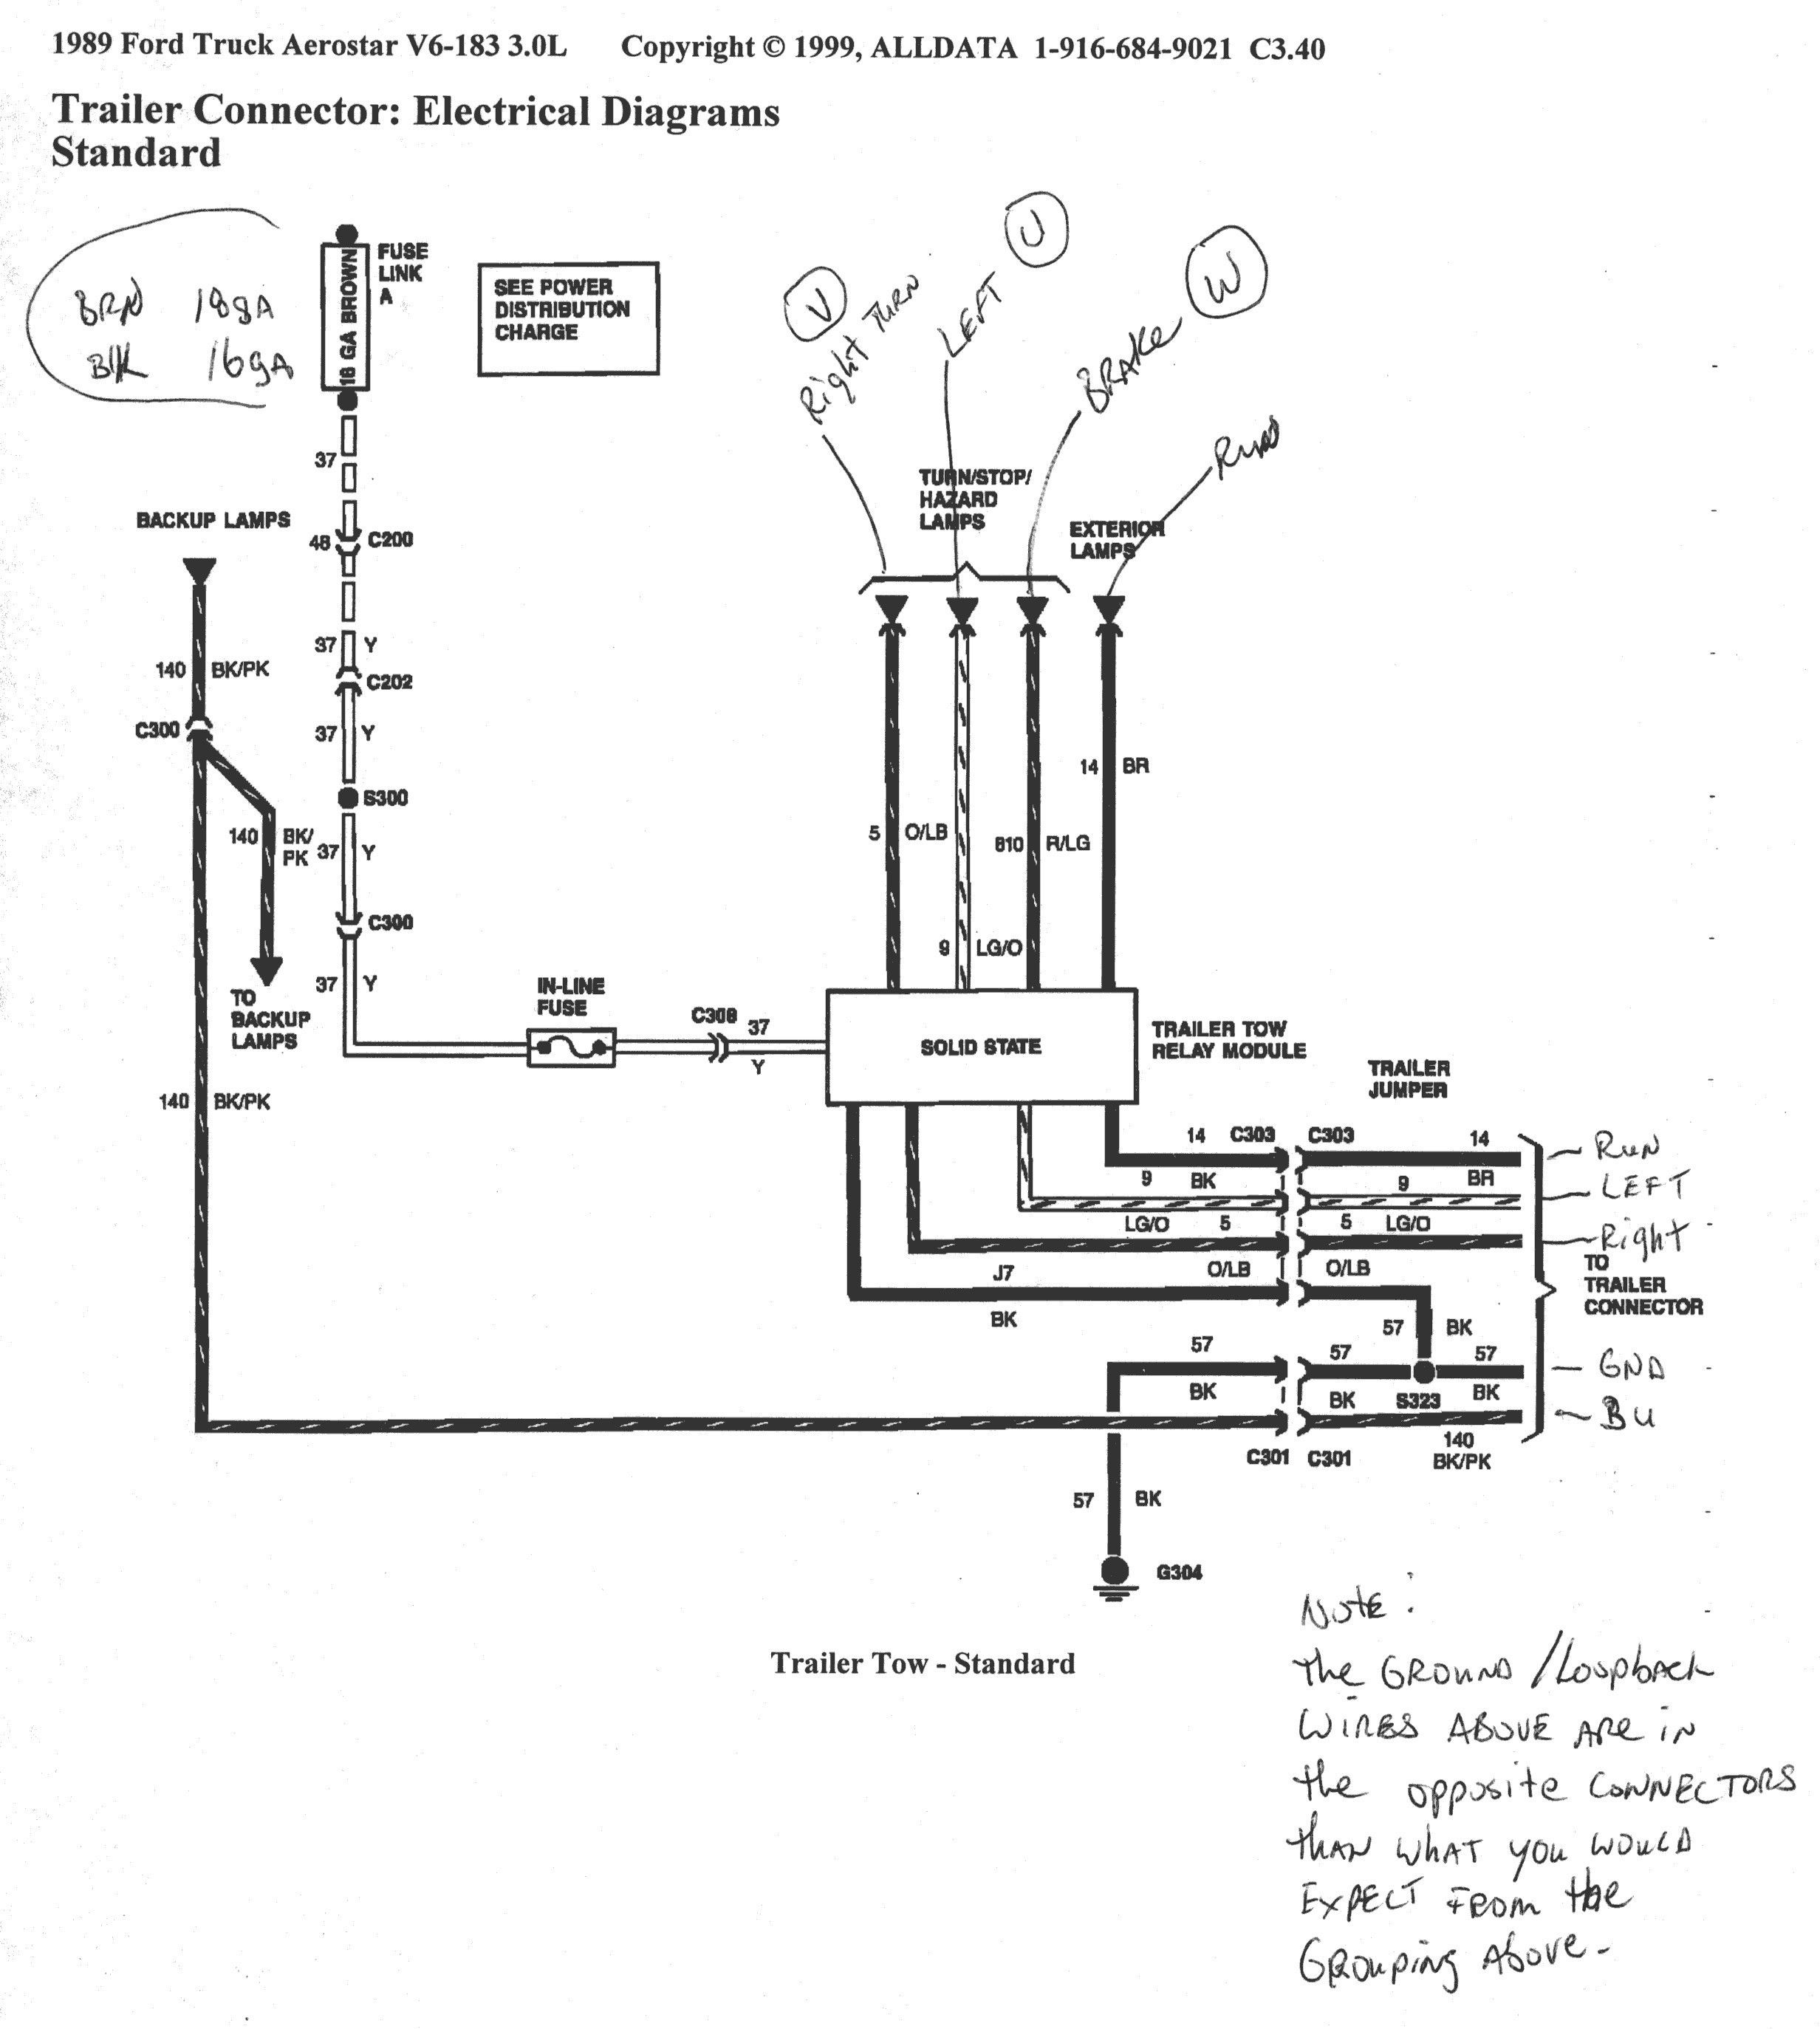 Unique Ford Explorer Trailer Wiring Diagram In 2020 Trailer Wiring Diagram Diagram Electrical Diagram